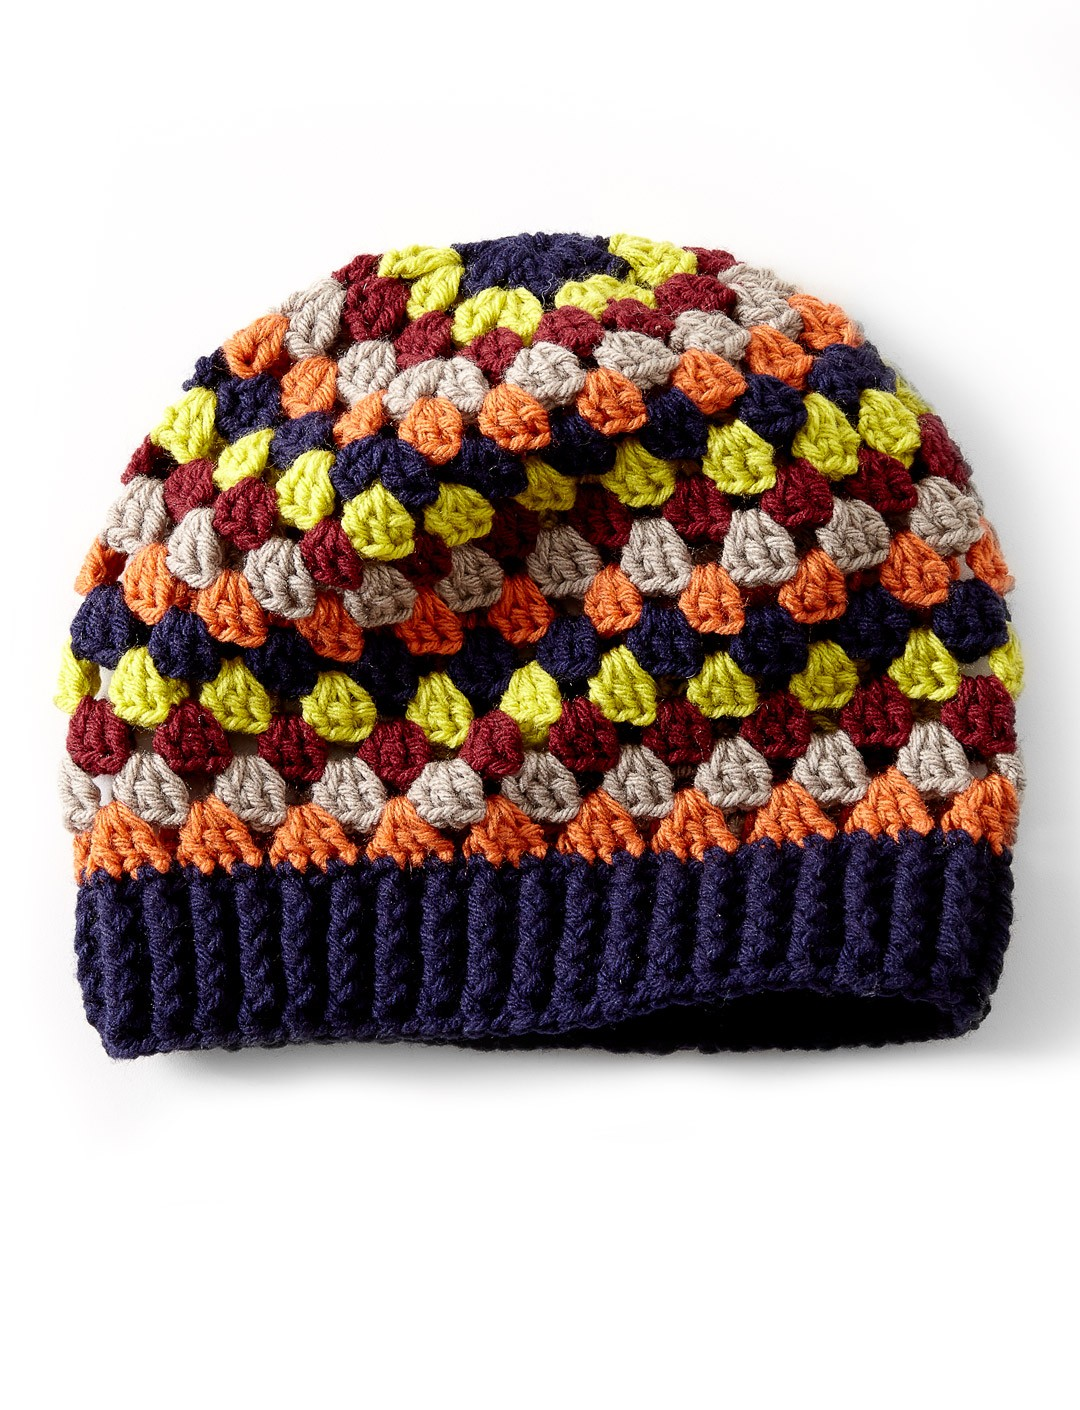 Granny Stripe Hat Granny Striped Crochet Hat ... 67286dc0146